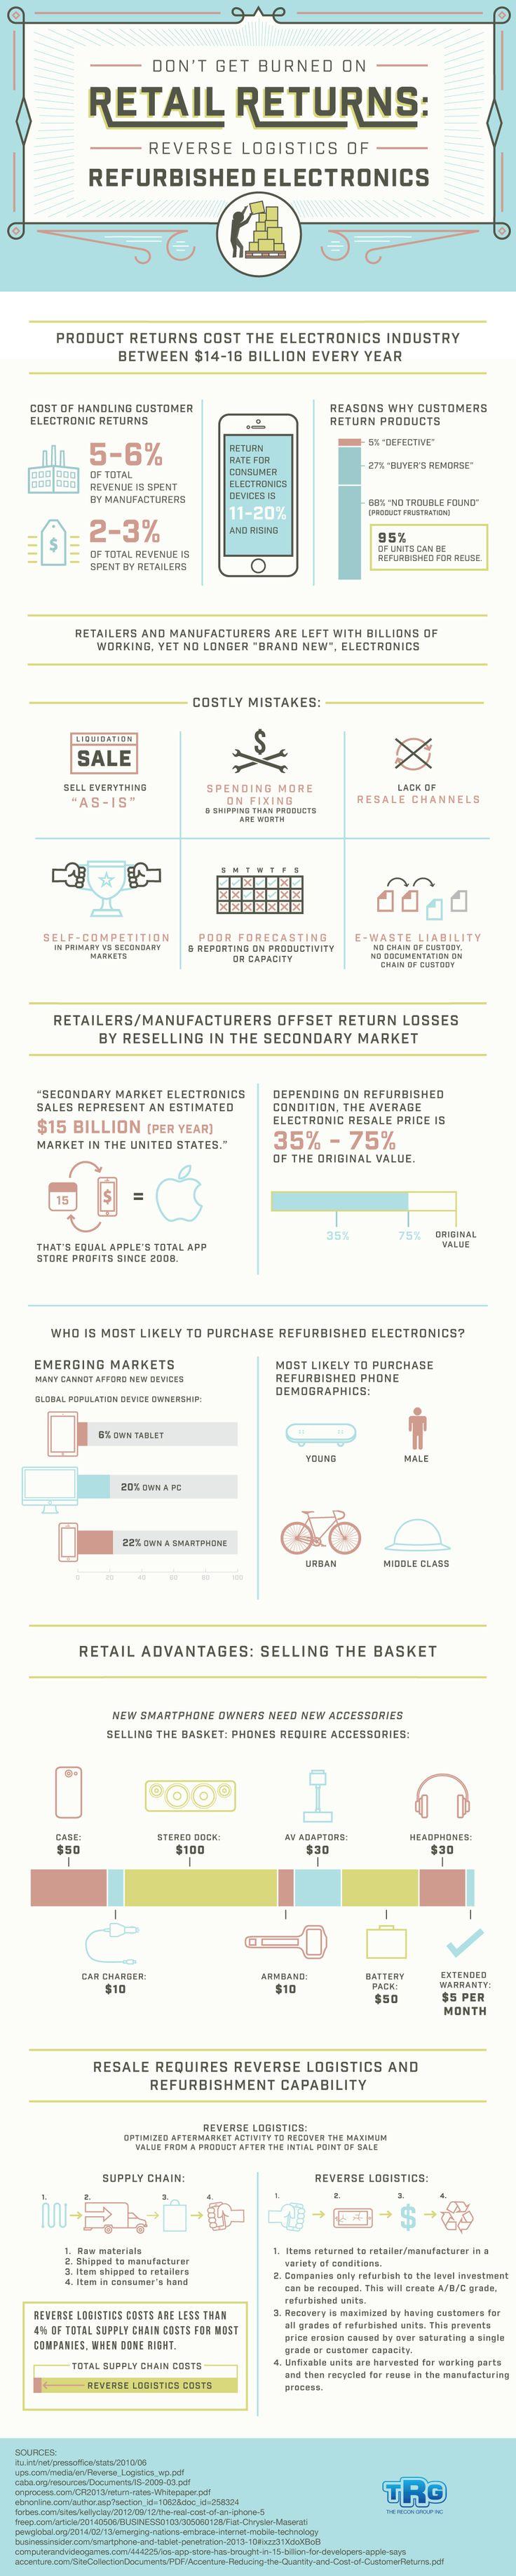 Reverse Logistics of Refurbished Electronics